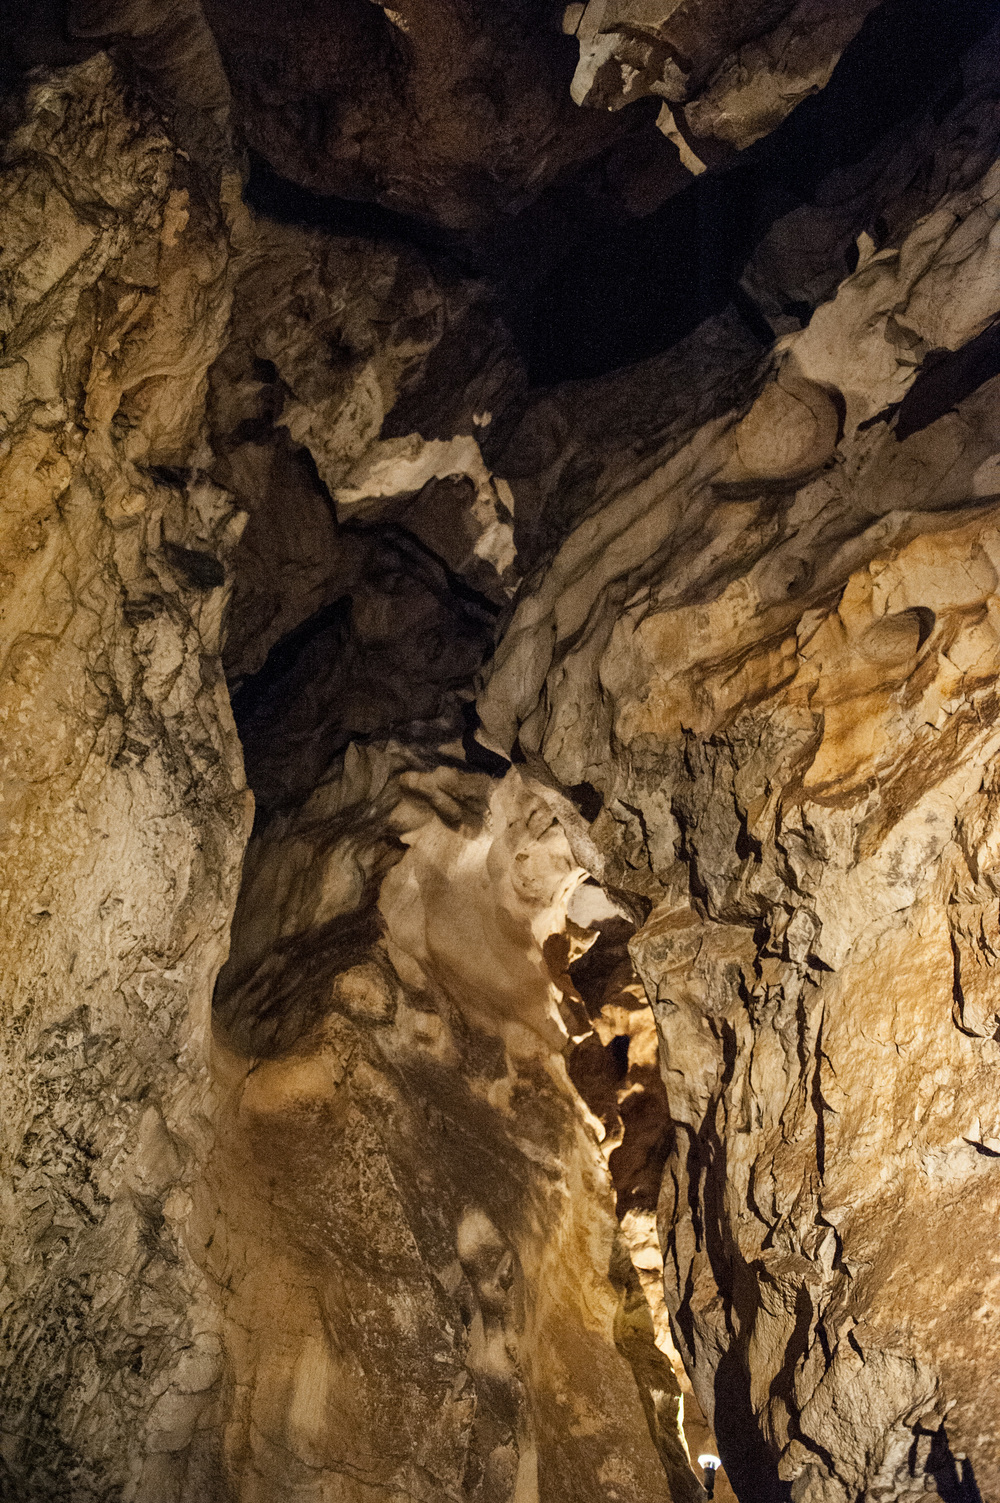 Nix_Höhle_002.jpg